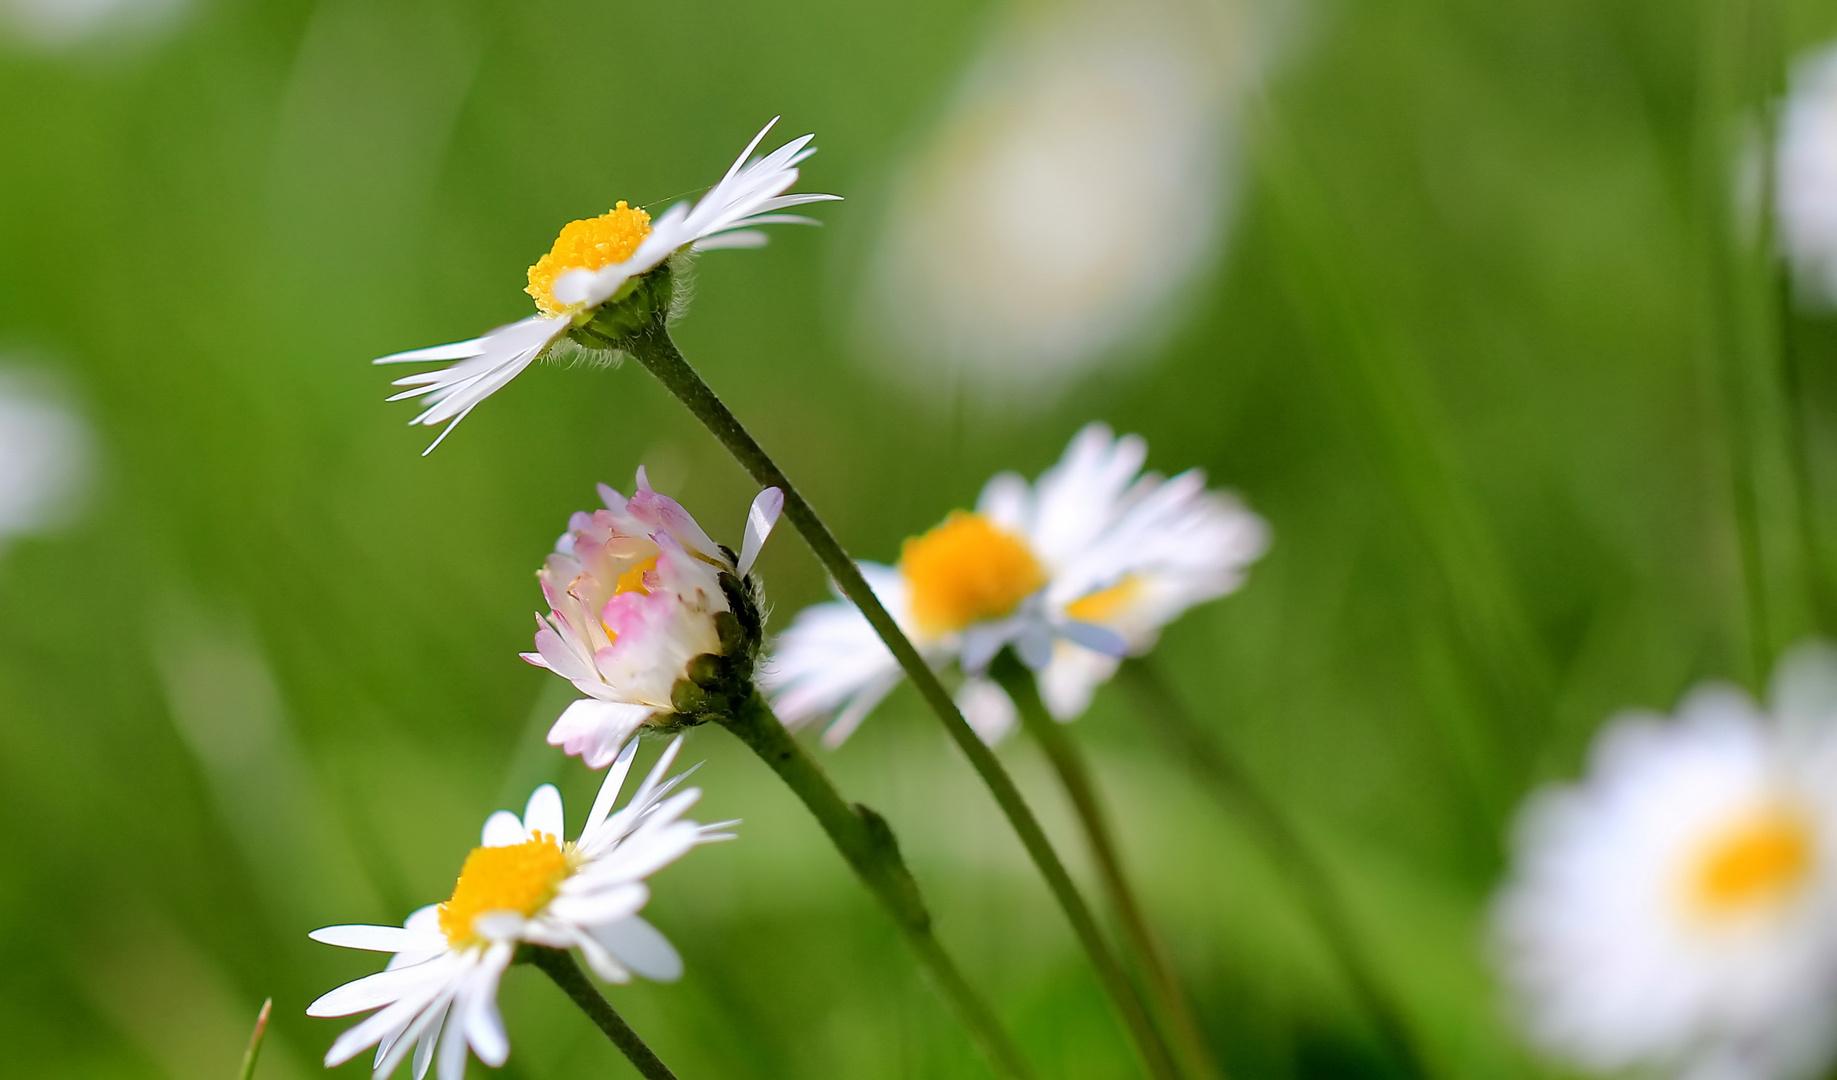 Faszination Wiesenblume 2